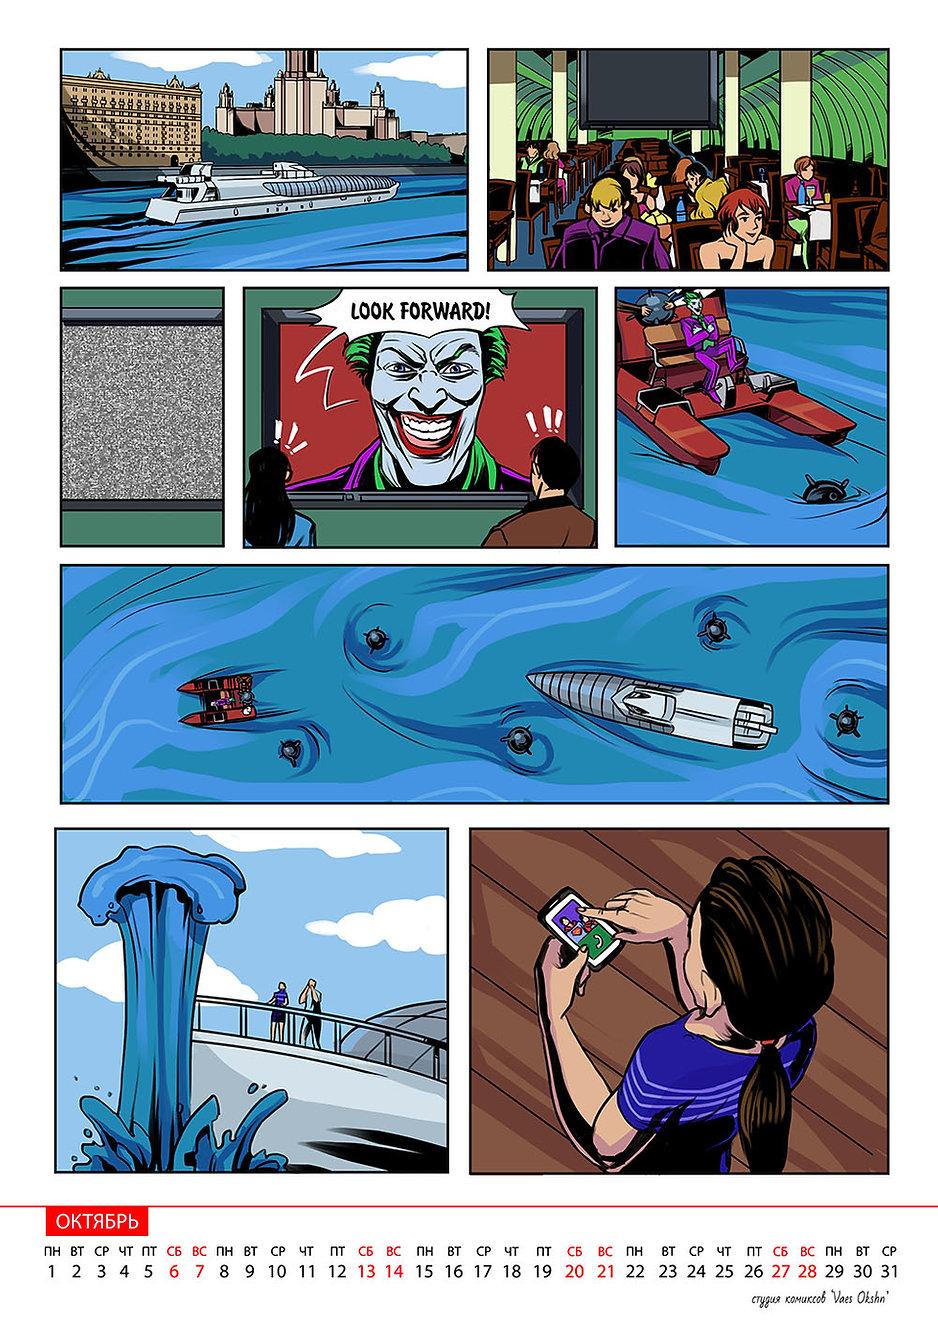 Корпоративный календарь в виде авторского комикса.